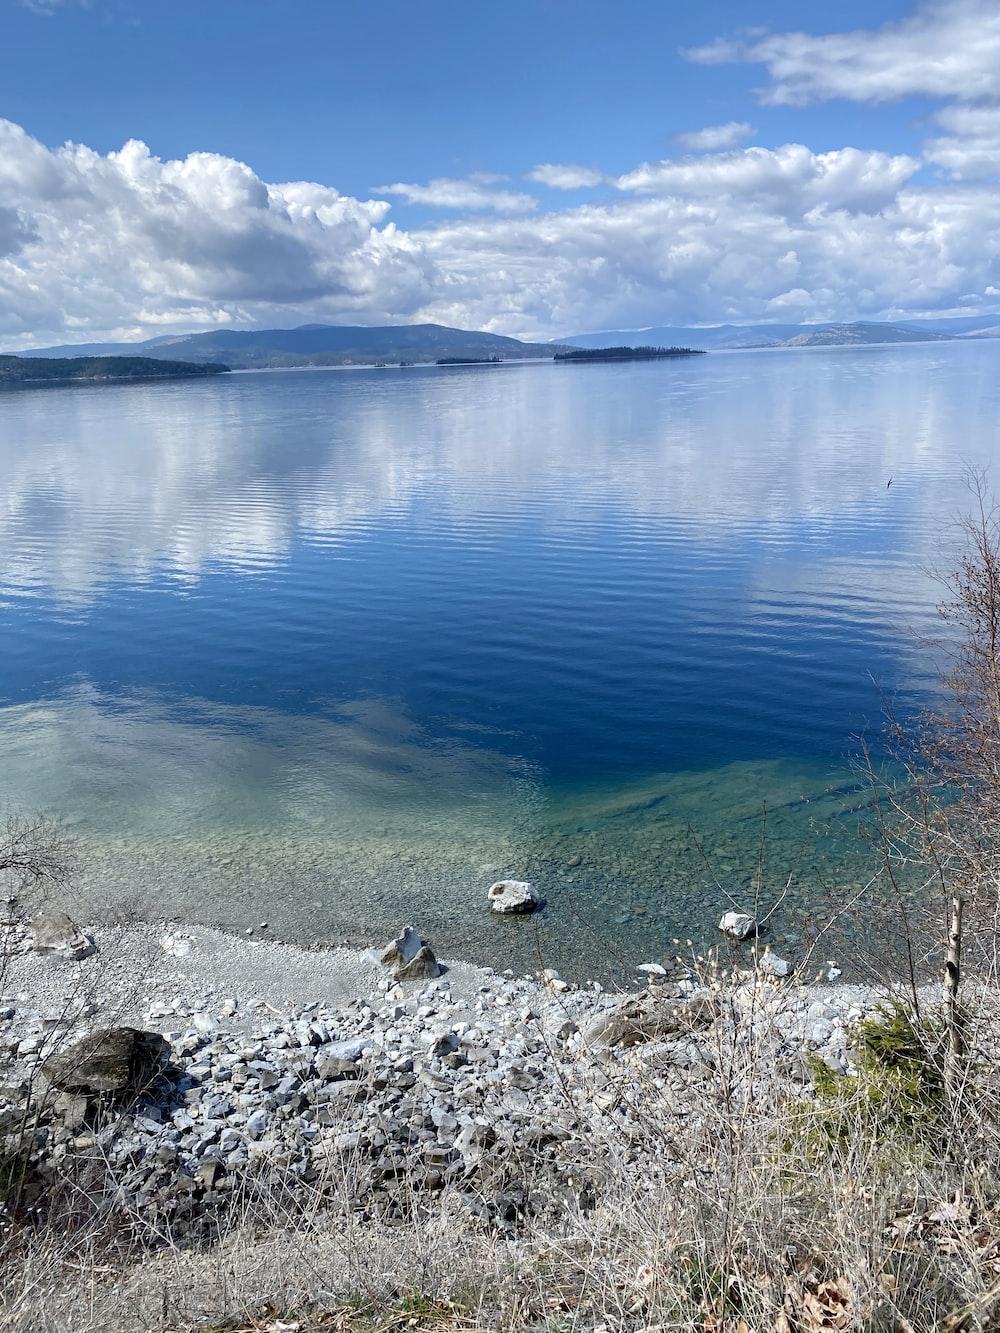 blue calm water near gray rocks during daytime